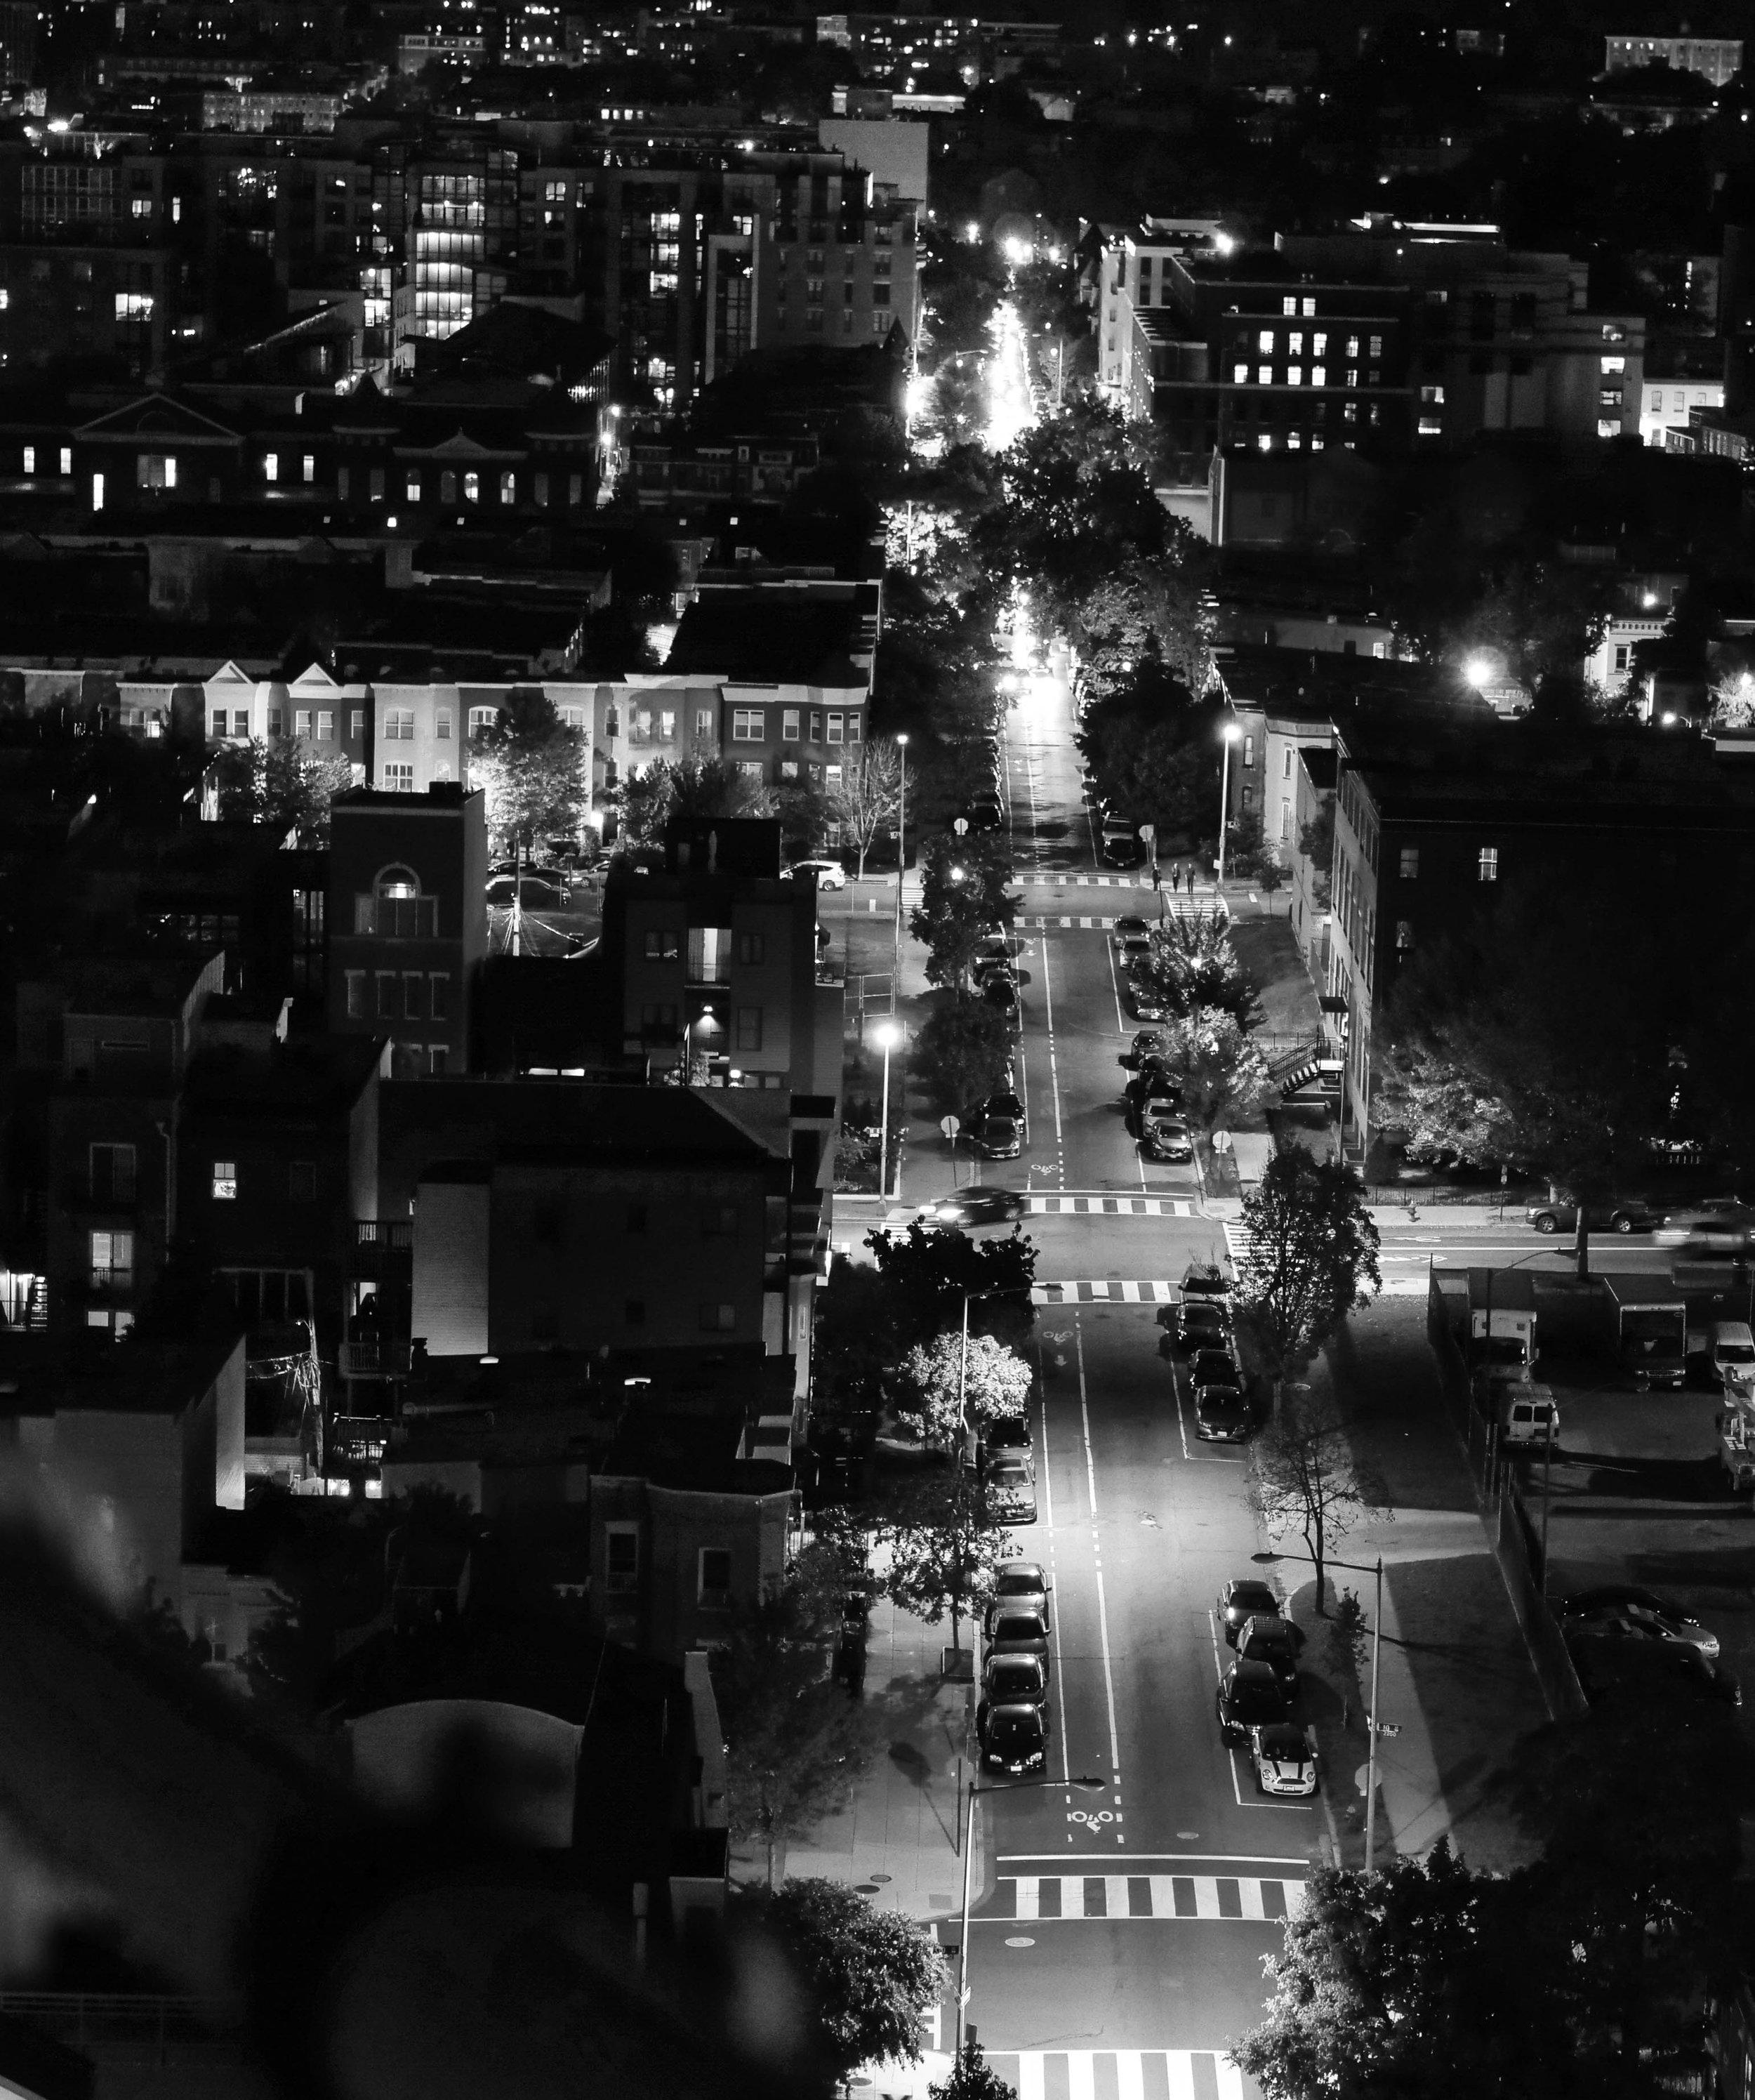 looking down the street bw-1366659.jpg